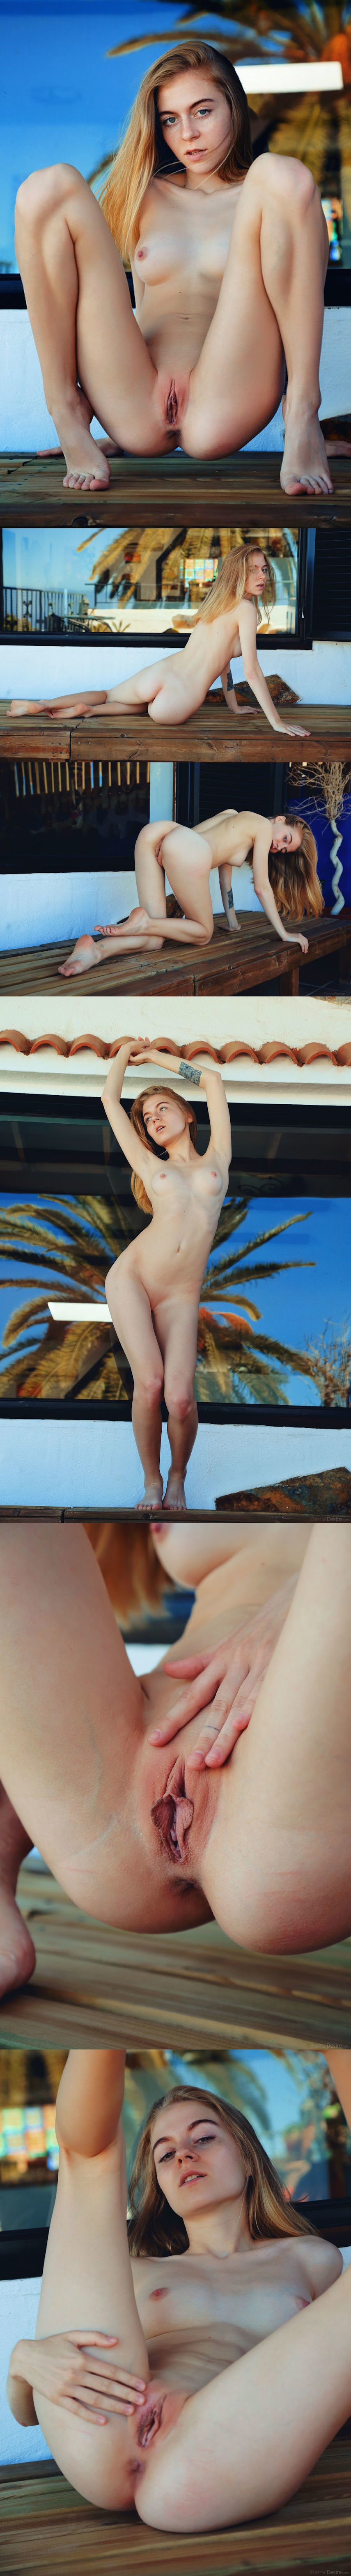 [EternalDesire] Shayla - Palm sexy girls image jav